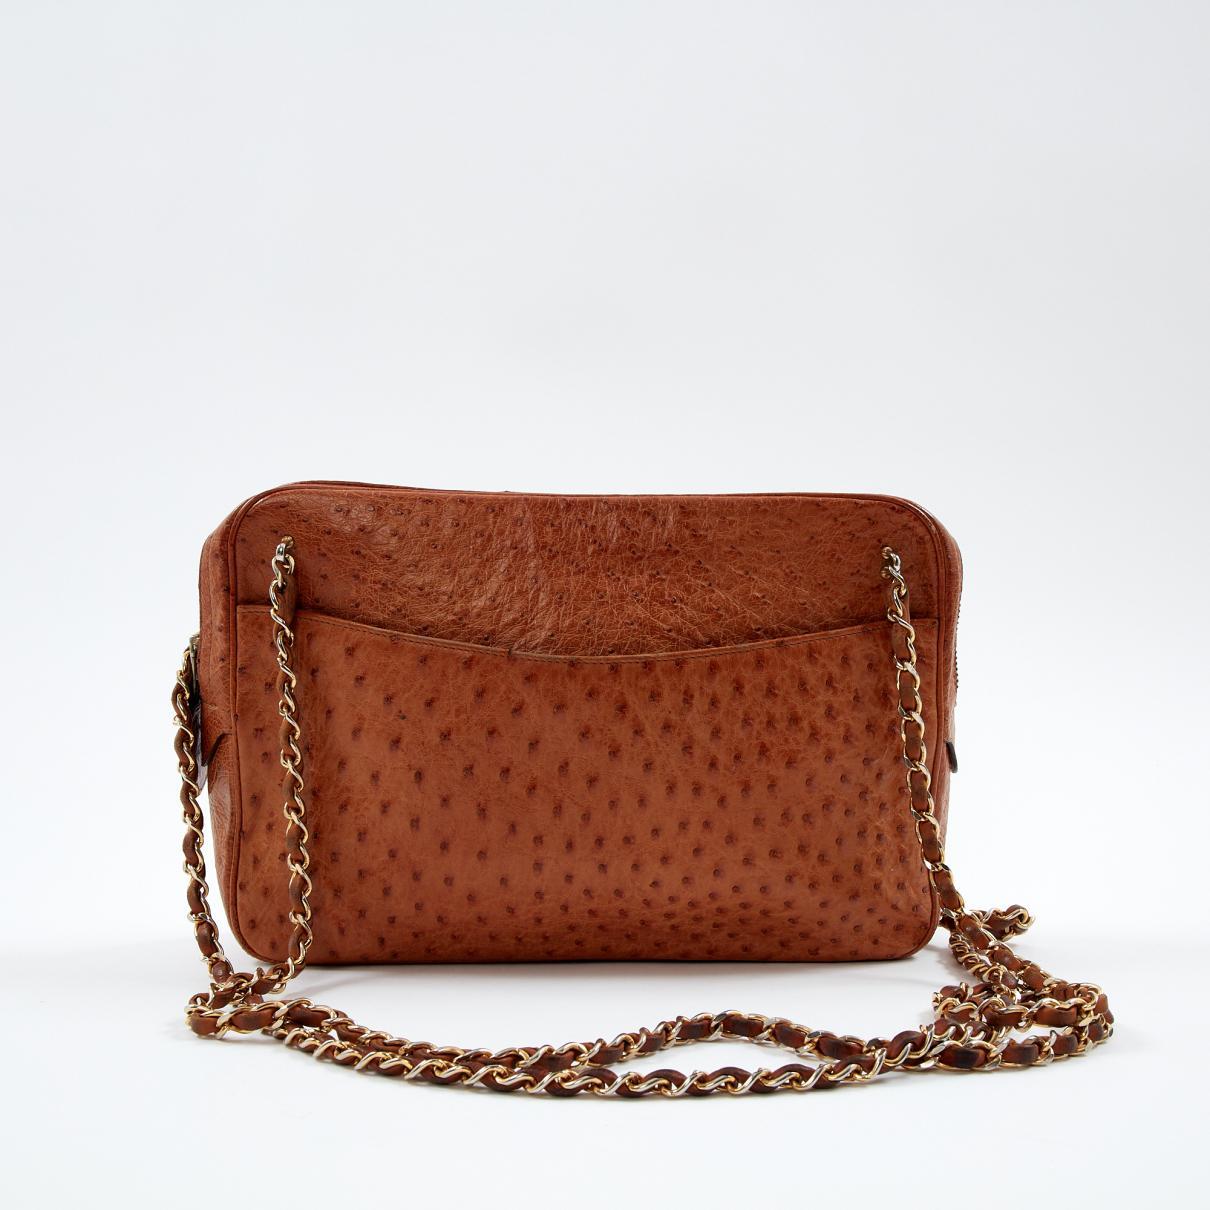 90c8f12f5c17 Chanel - Brown Vintage Camera Camel Ostrich Handbag - Lyst. View fullscreen